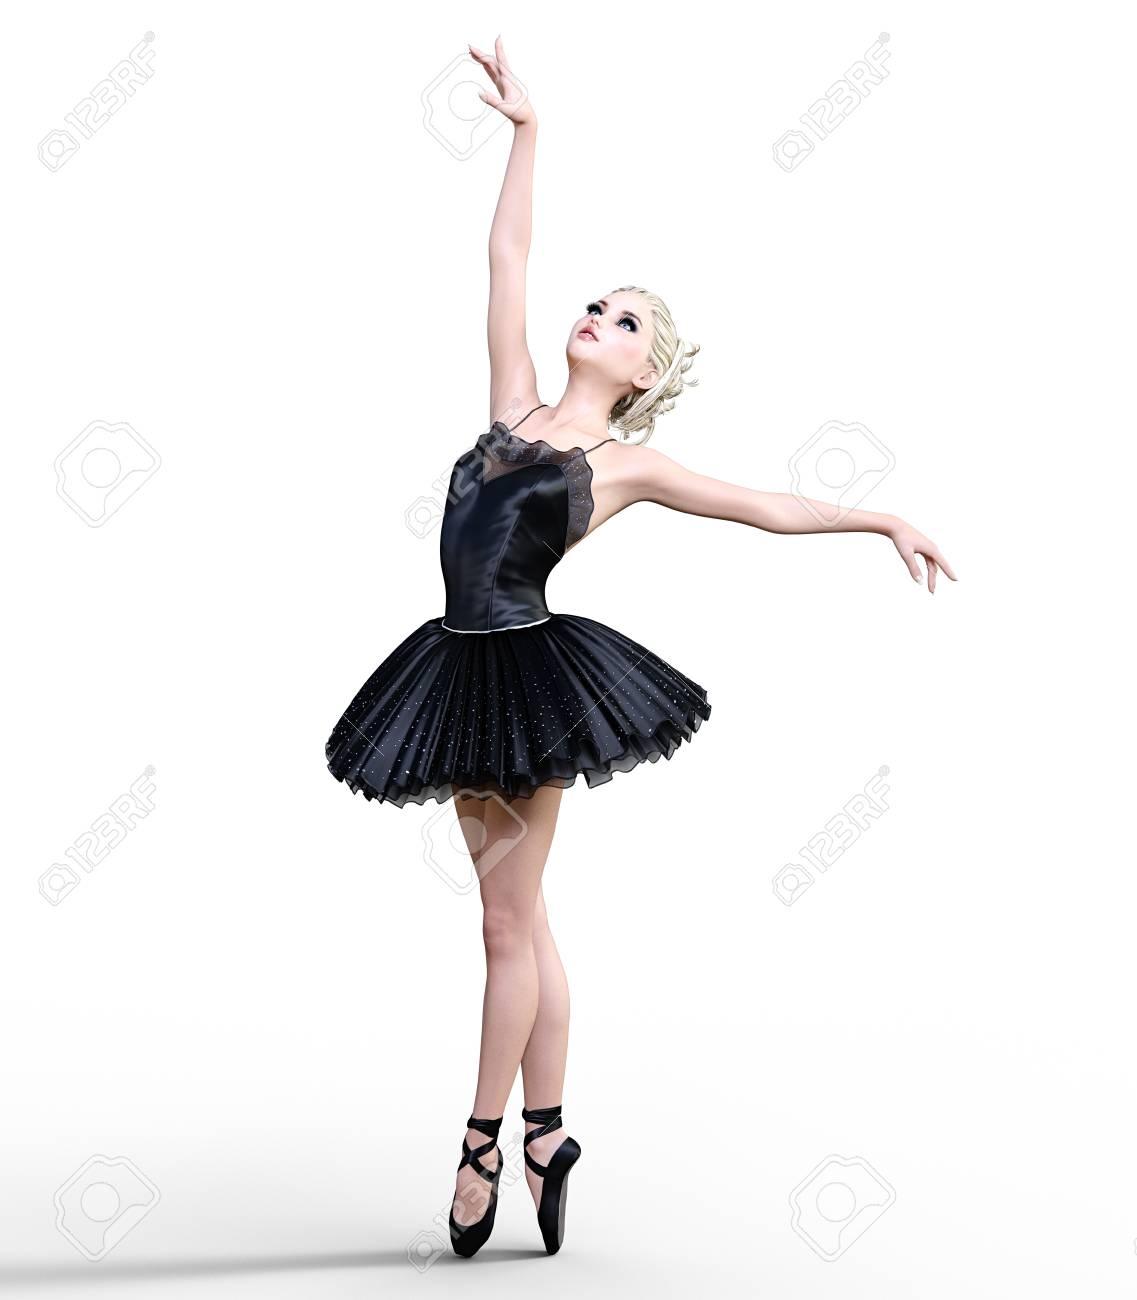 dancing ballerina 3d black ballet tutu blonde girl with blue